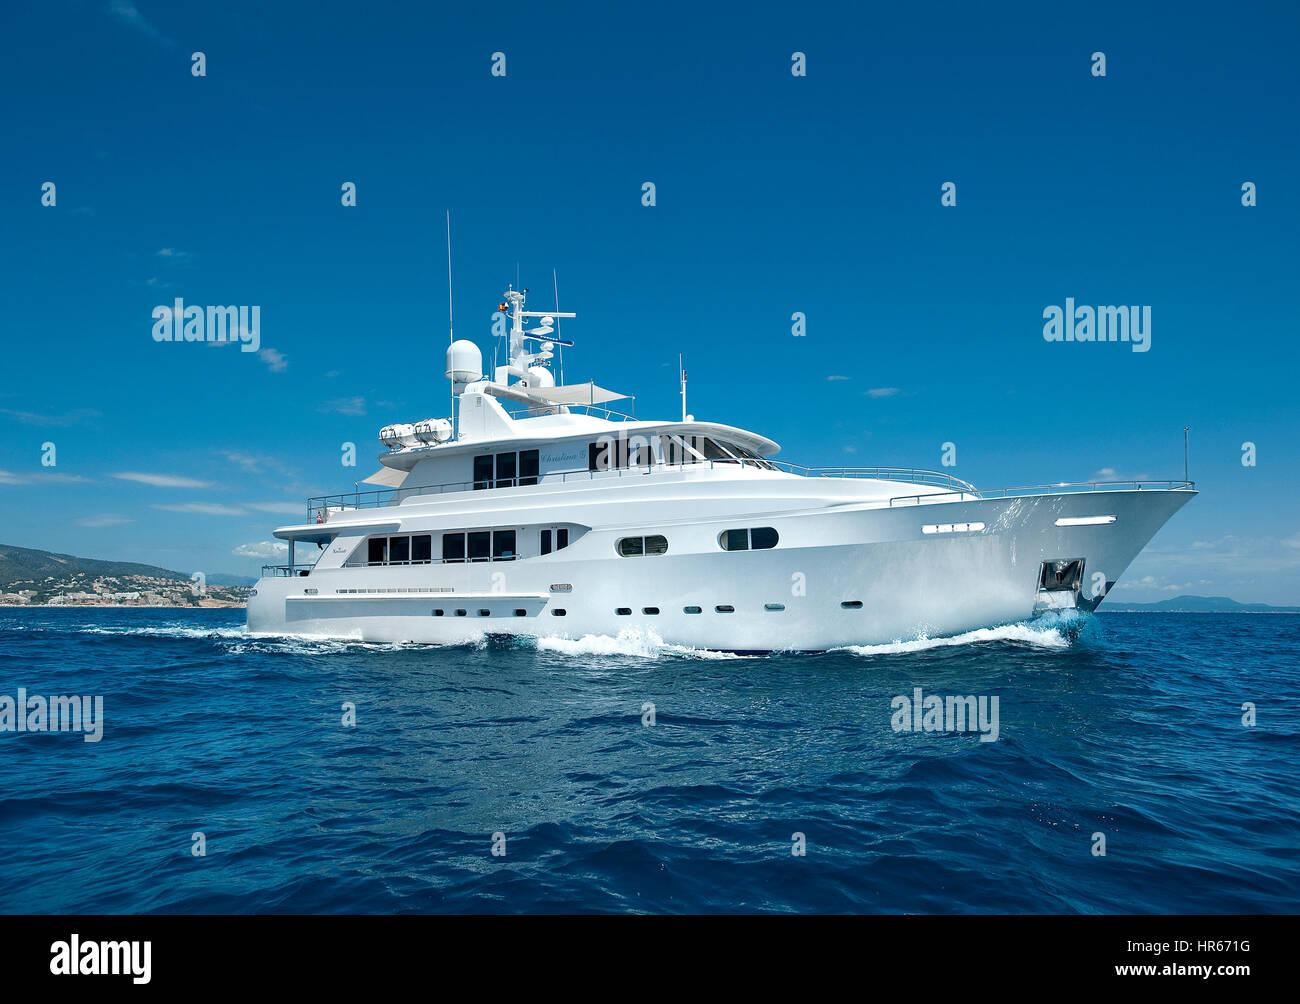 Luxury Yacht in Mediterranean - Stock Image